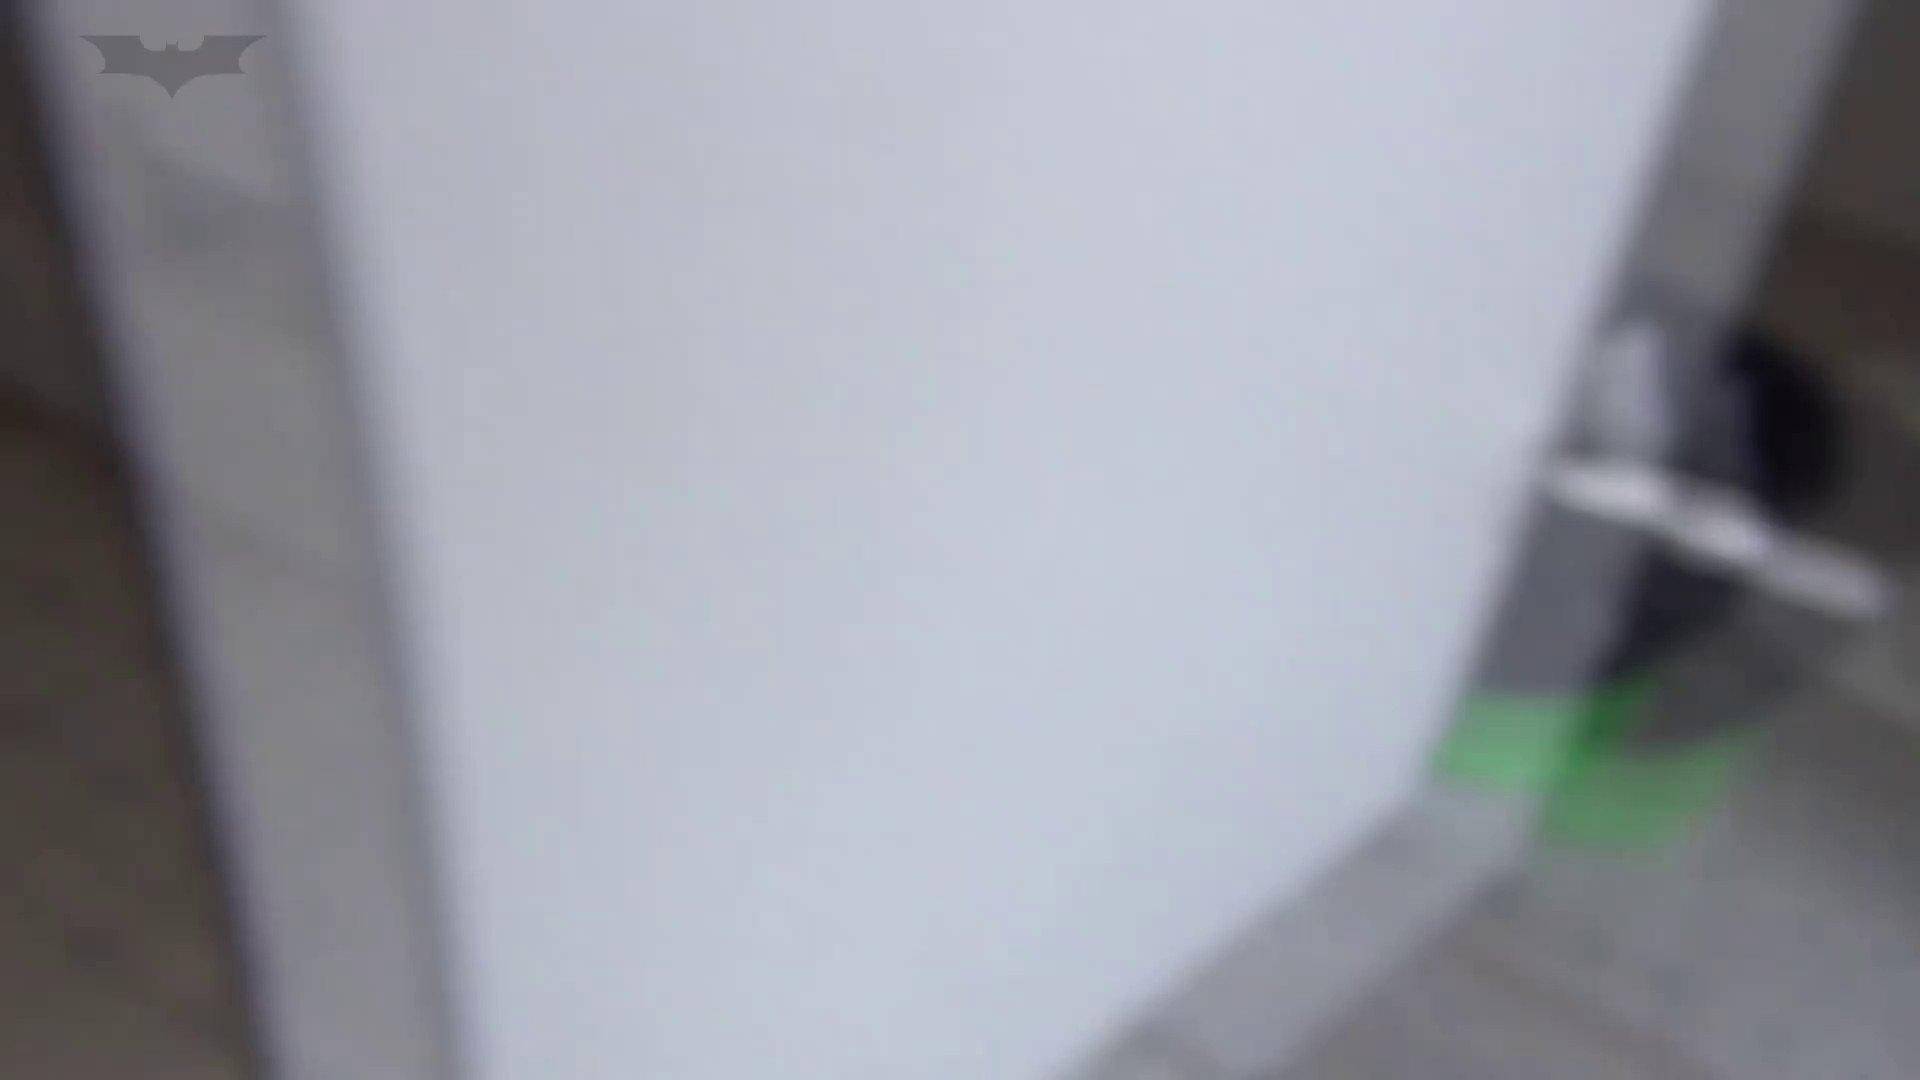 JD盗撮 美女の洗面所の秘密 Vol.22 盗撮大放出 オマンコ無修正動画無料 64連発 17